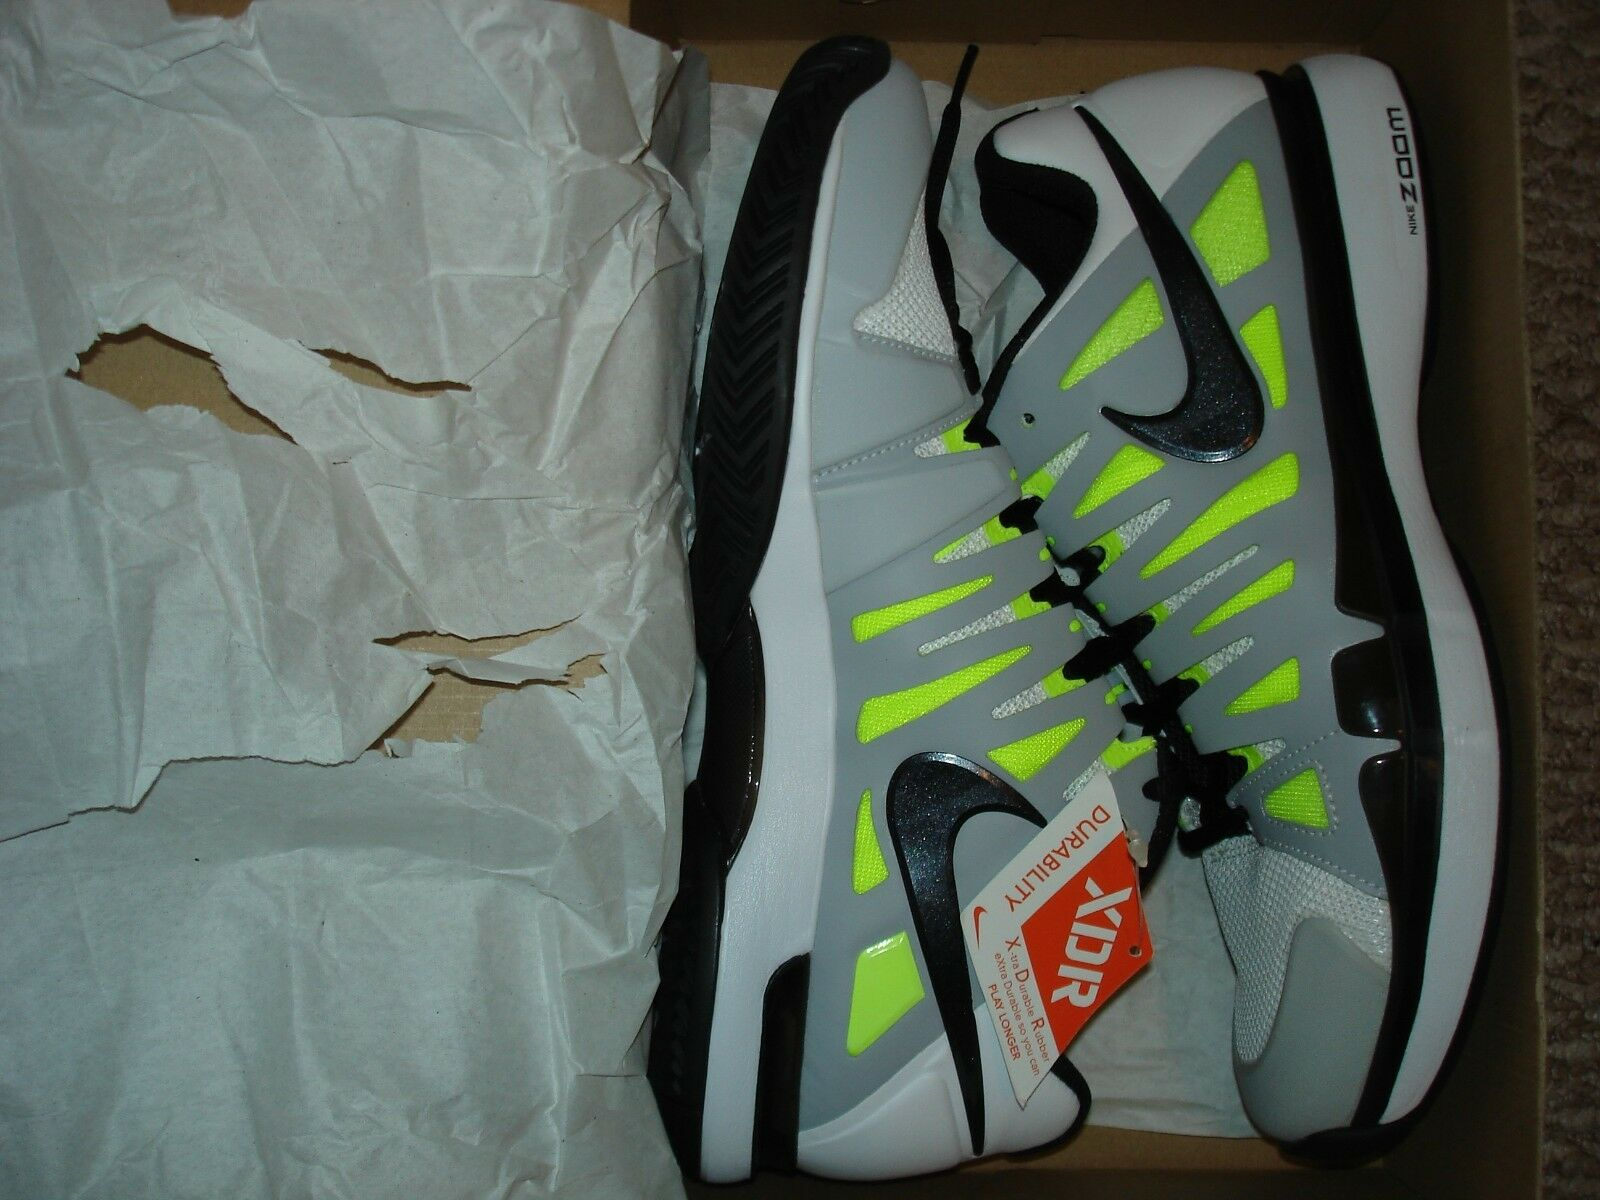 NIB Nike Federer ZOOM VAPOR 9 TOUR bianca Tennis scarpe 488000-100 Dimensione 8.5 RARE